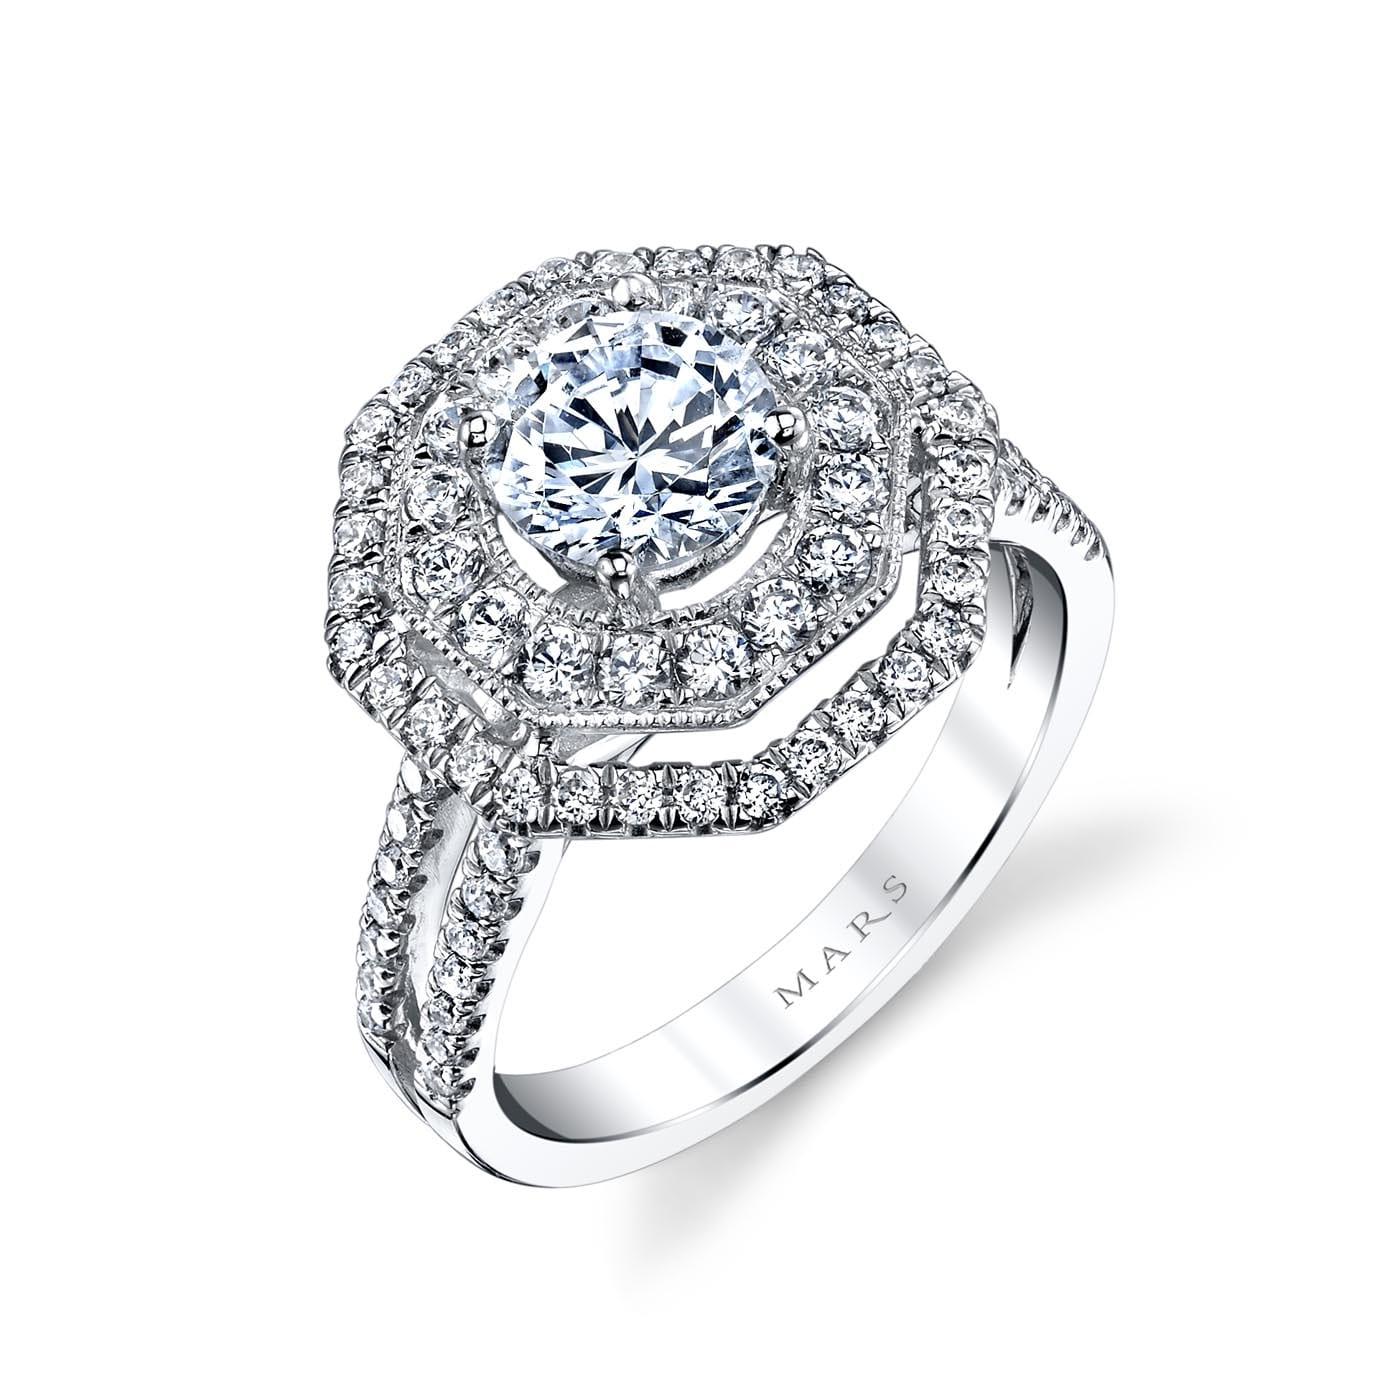 Halo Engagement RingStyle #: MARS 25620